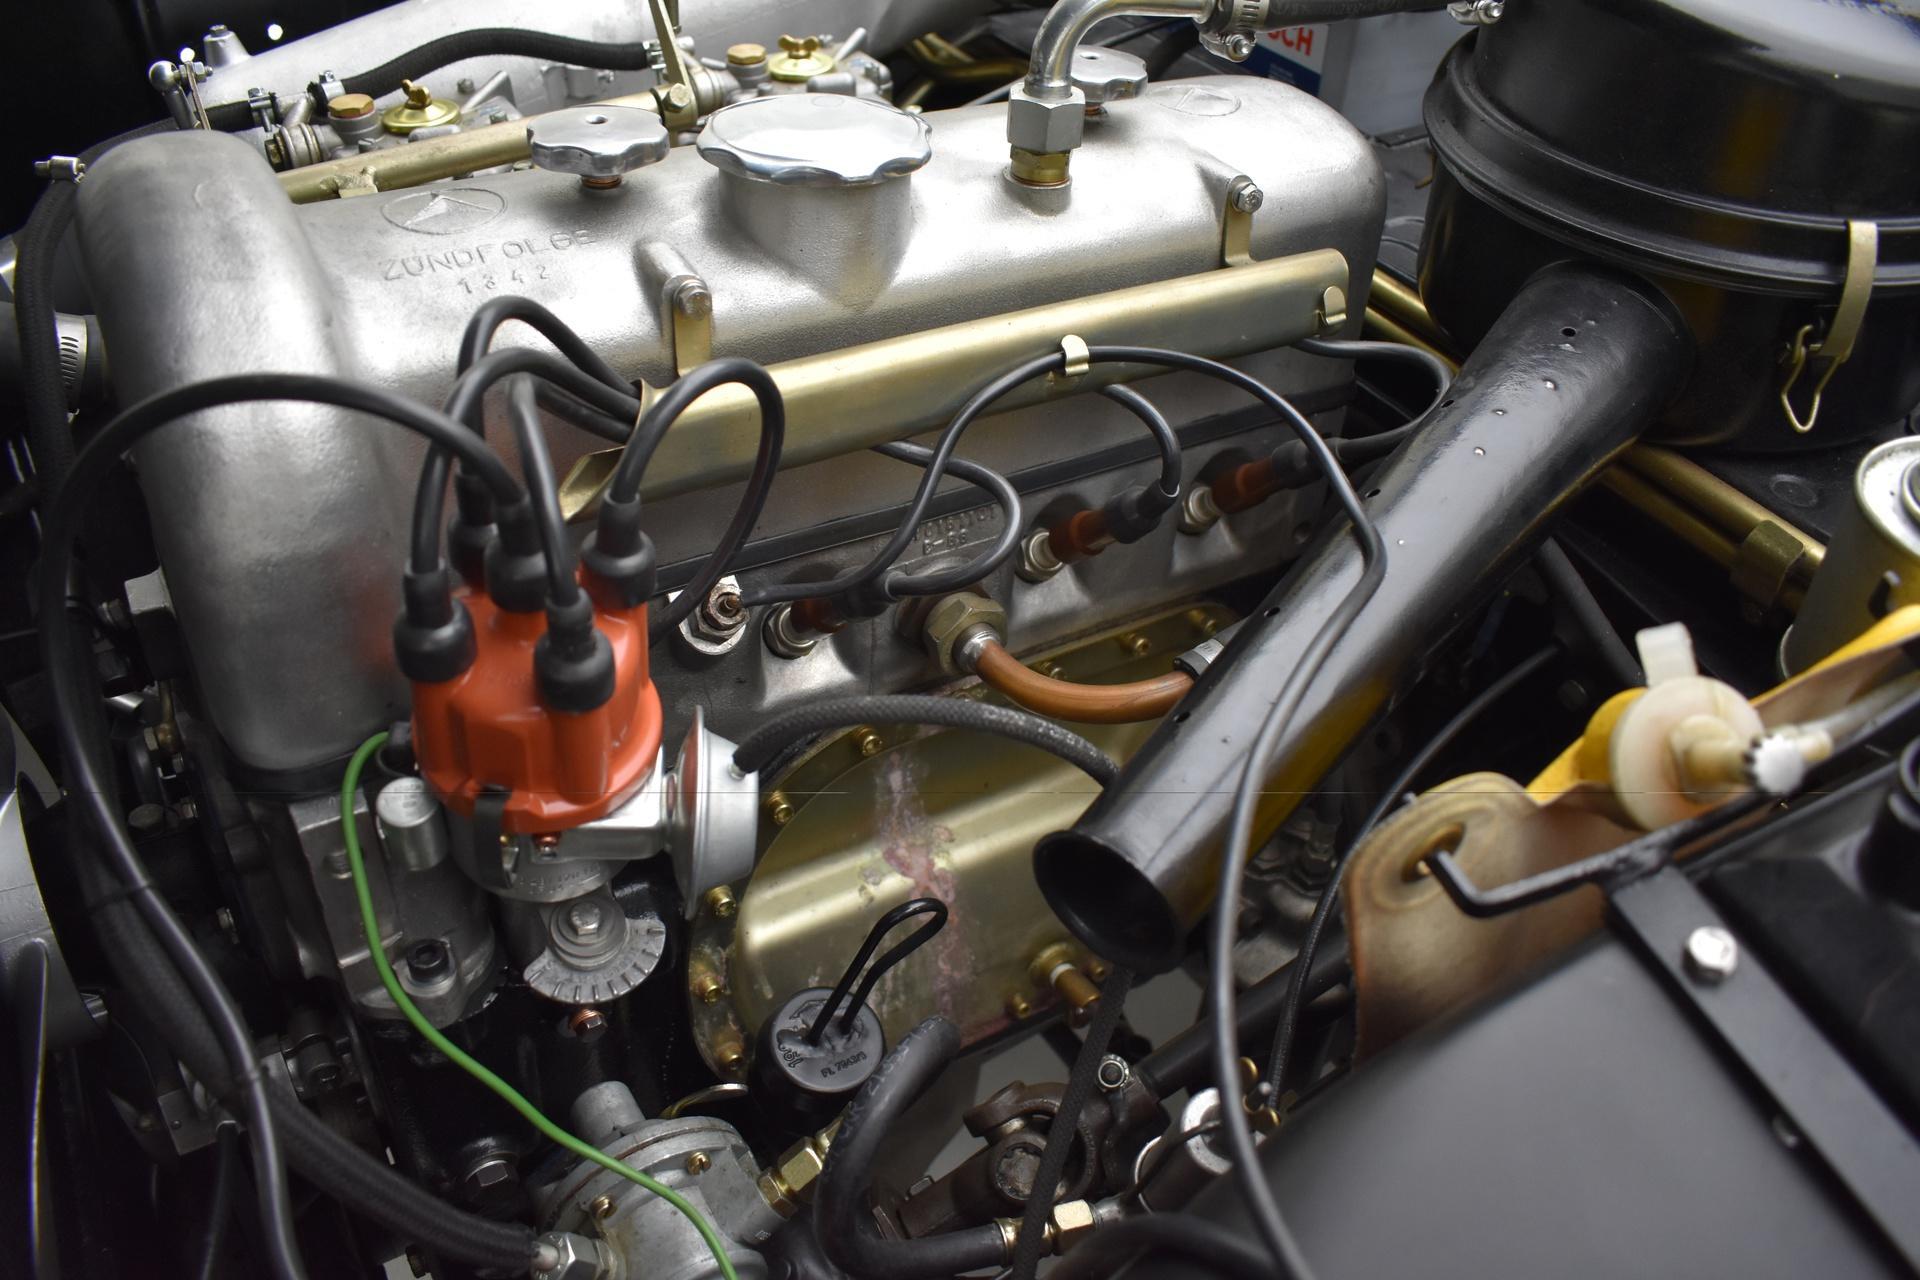 Mercedes-Benz 190 SL Roadster engine